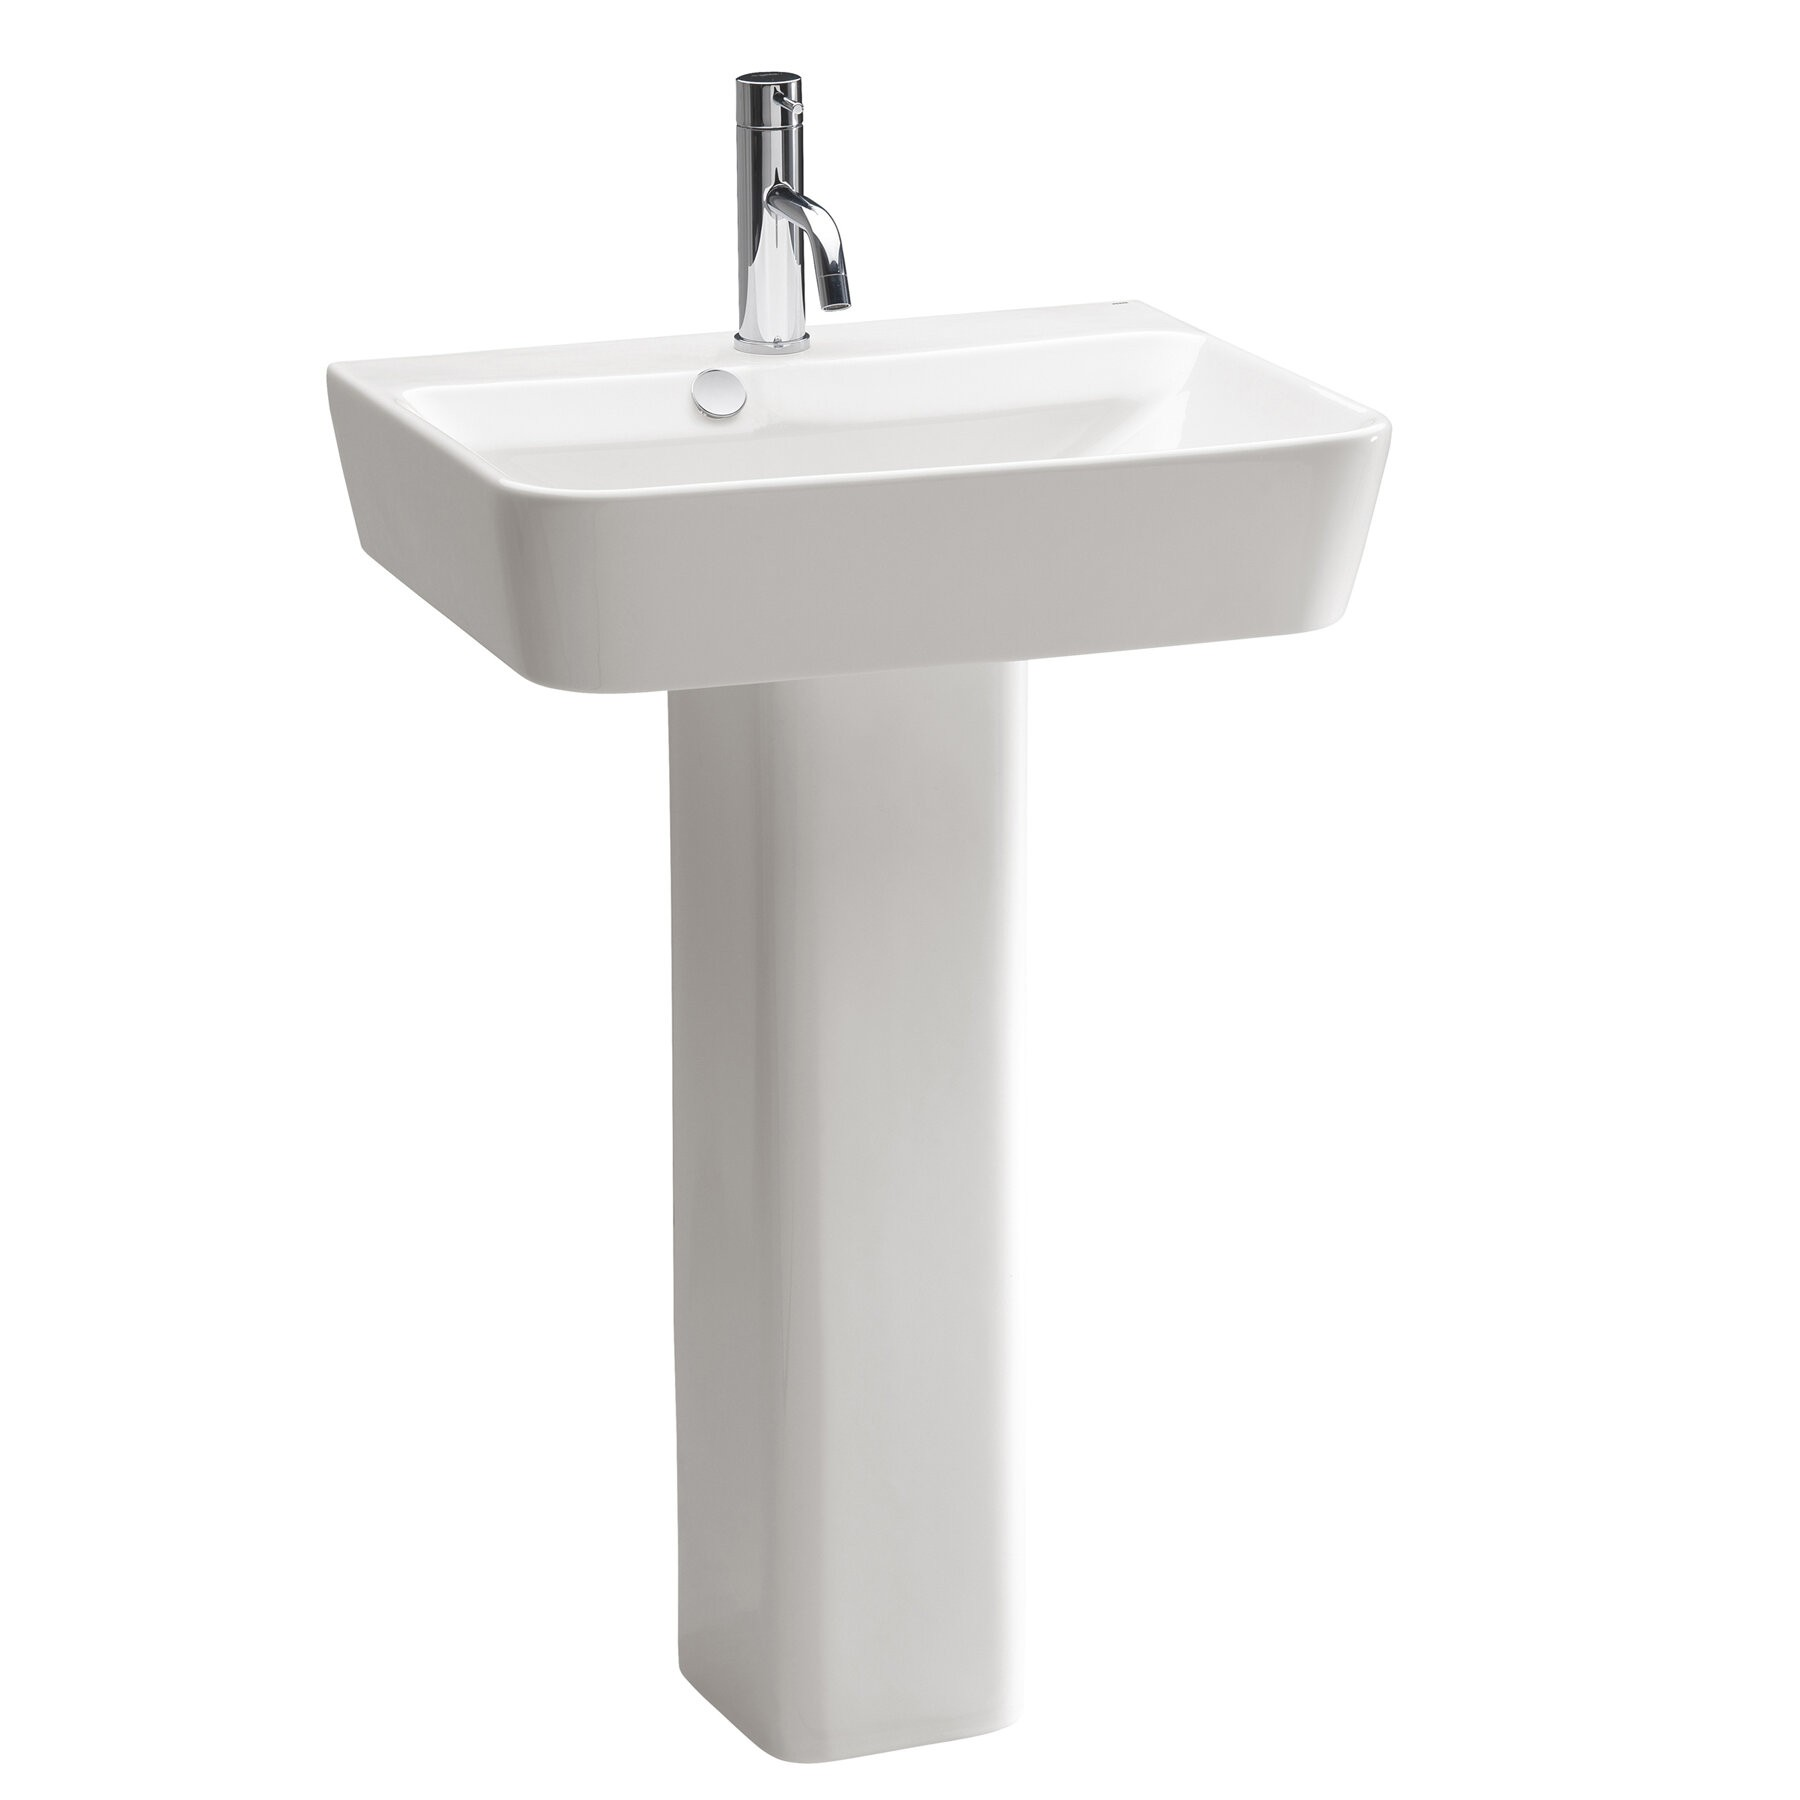 Modern Pedestal Sinks For Small Bathrooms Ideas On Foter